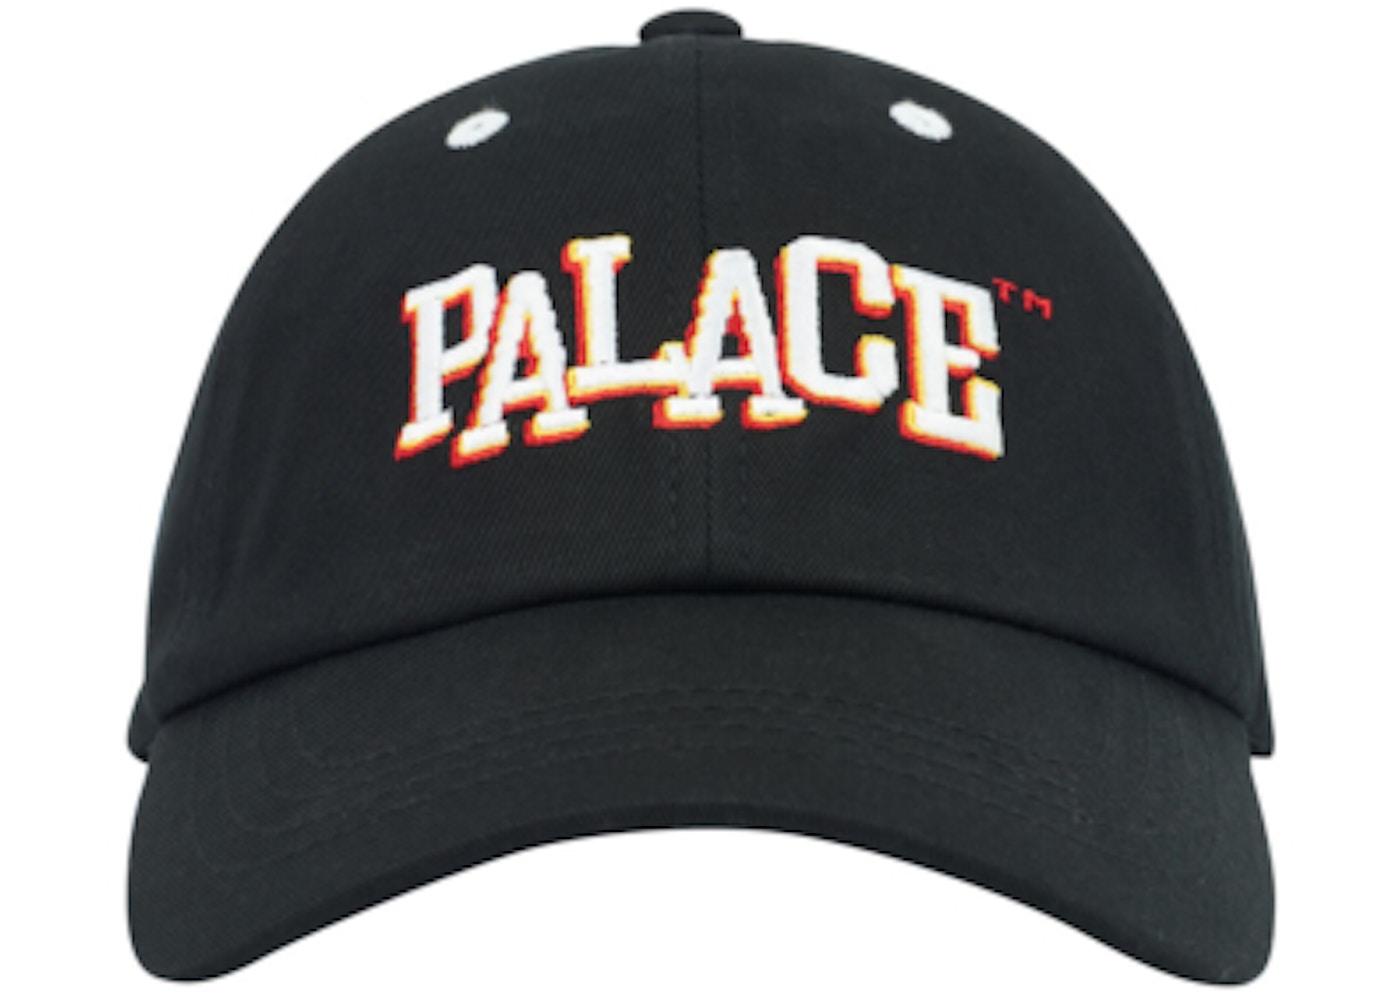 6a2319eb1657 Palace Pal Boy 6-Panel Black - FW18